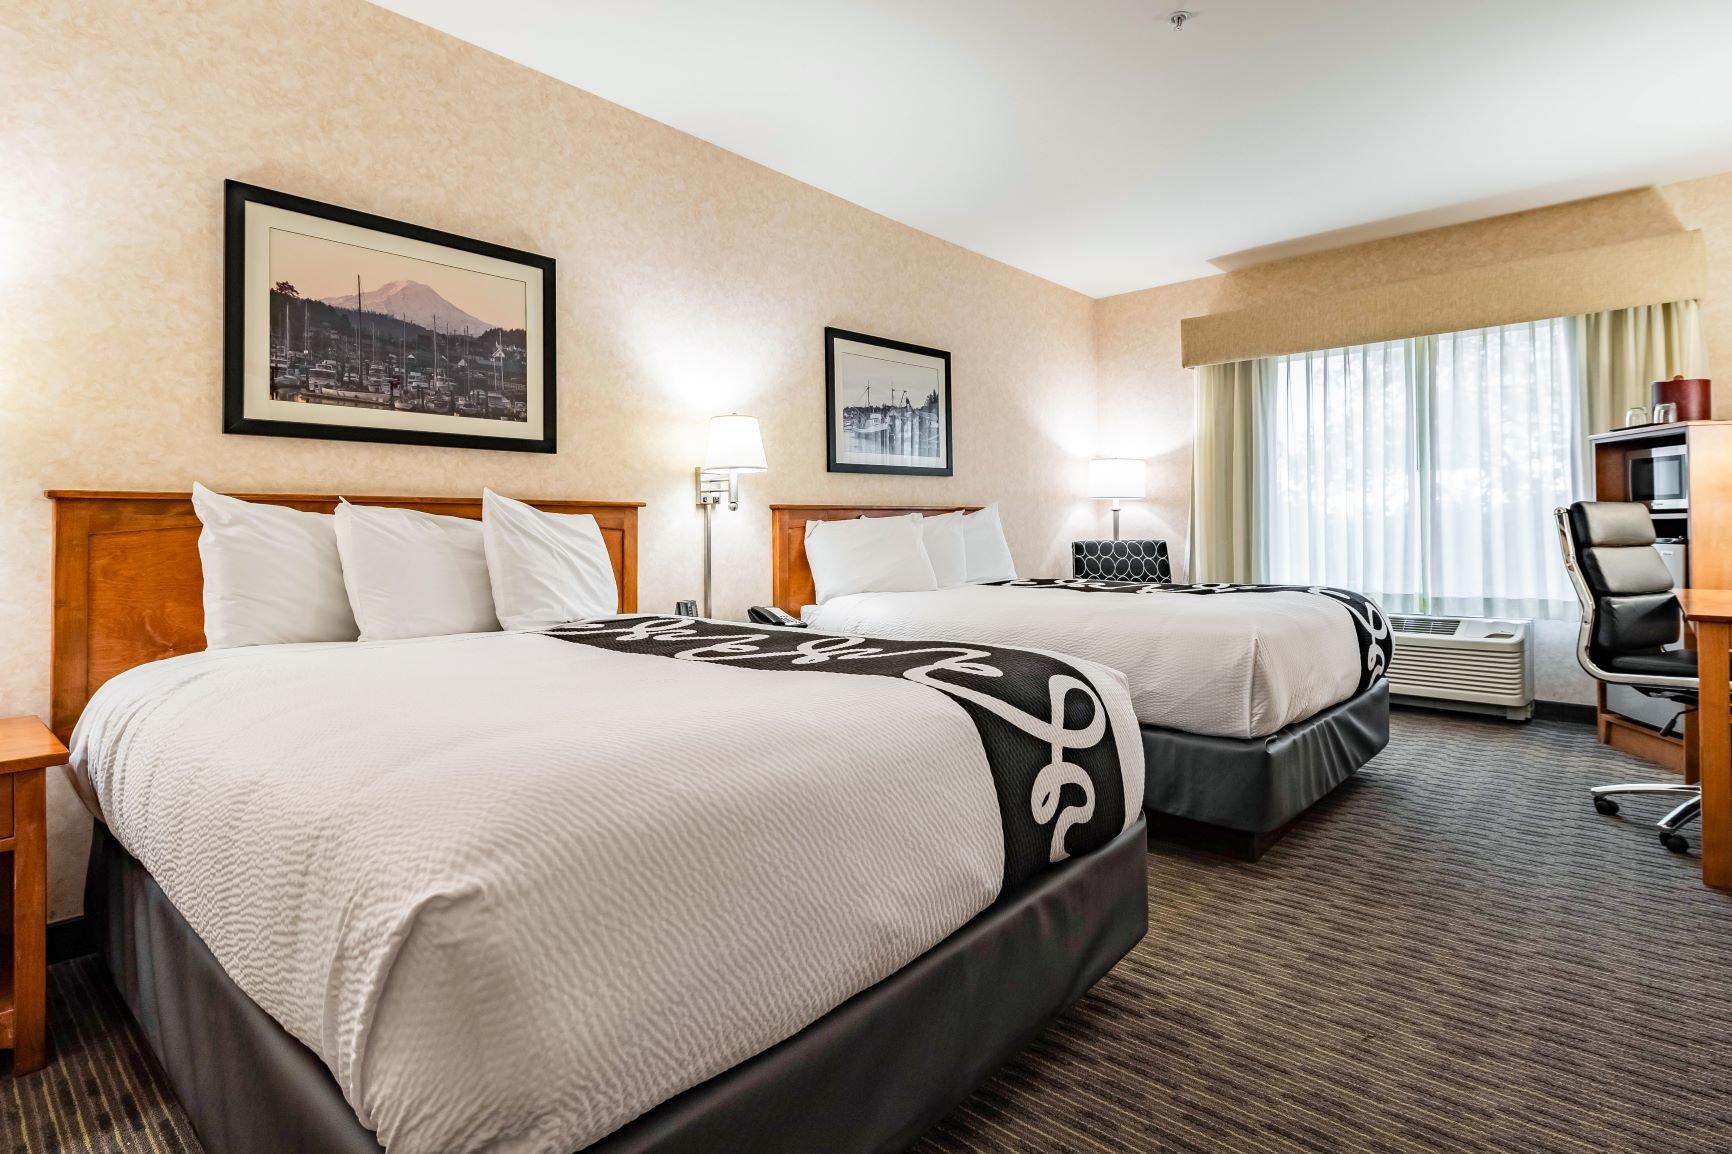 2 Queens Beds, Roll-in Shower ADA Accessible